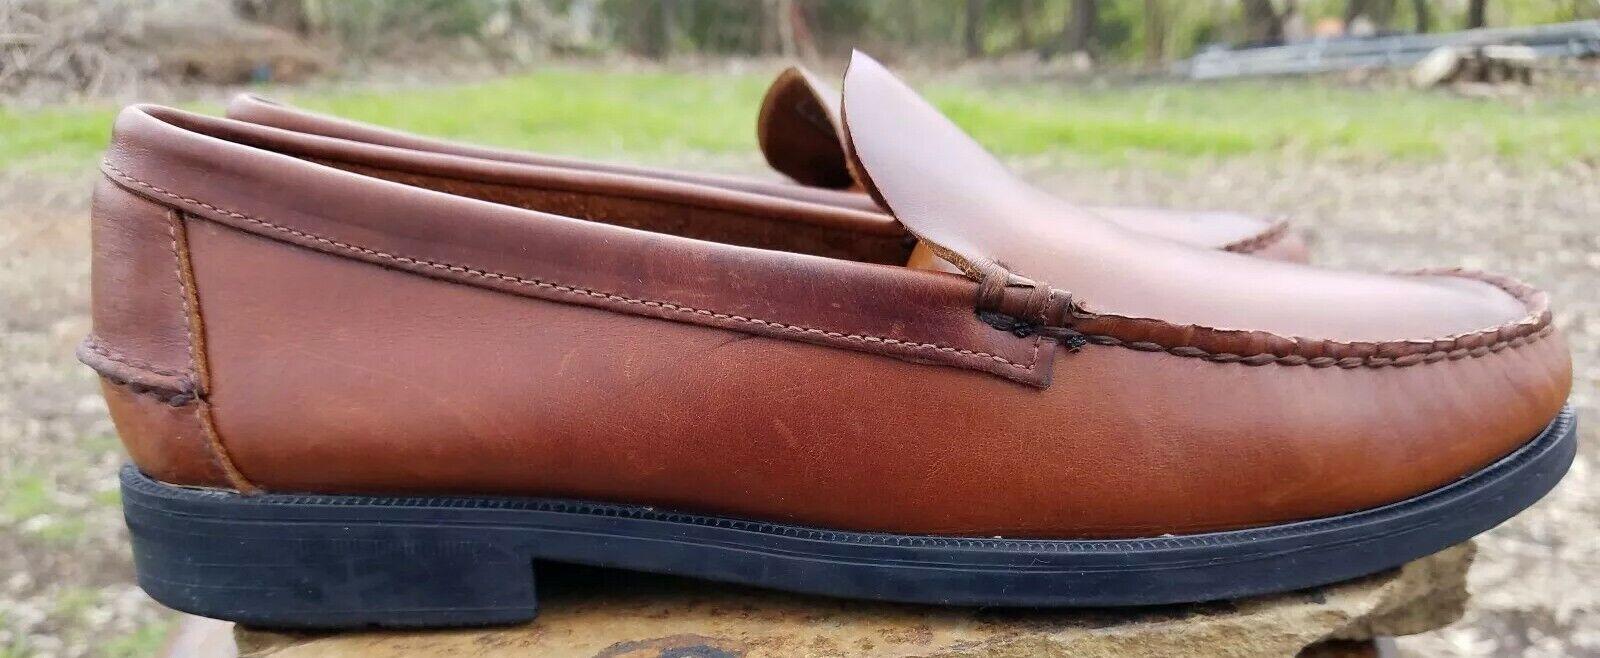 Sebago Men shoes Handsewn USA Brown Leather Moc Toe Slip-on Casual Loafer 11